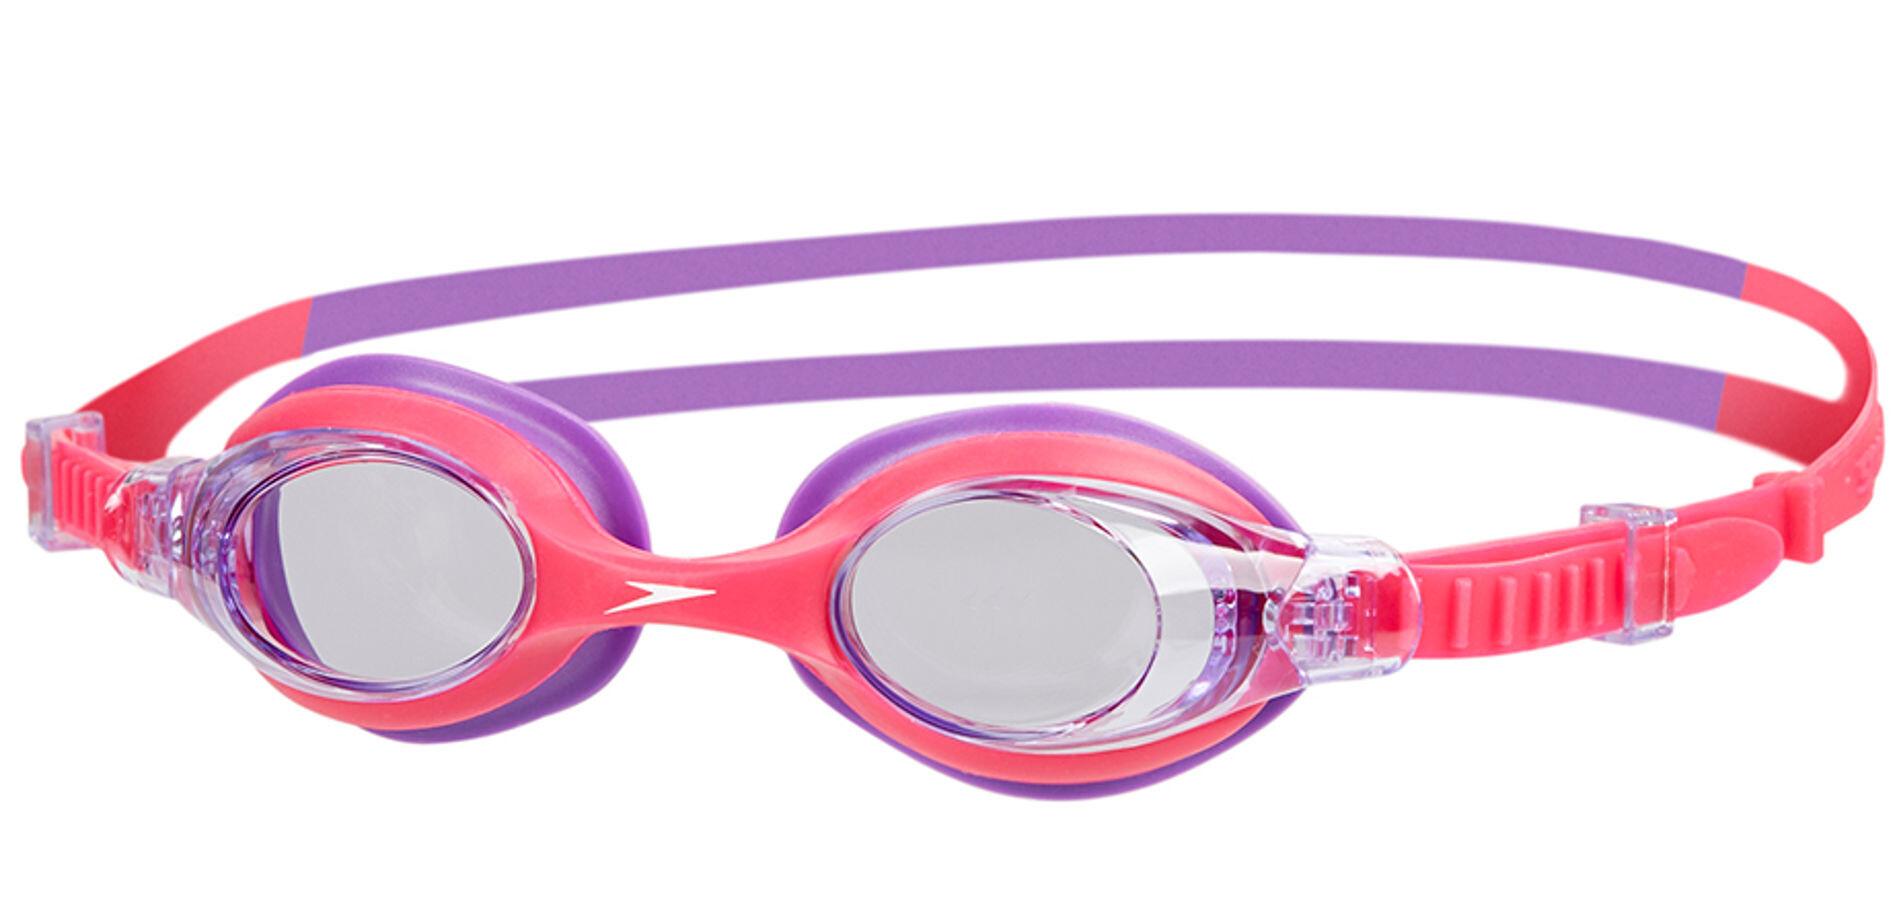 speedo sea squad goggle children pinkpurple at addnature